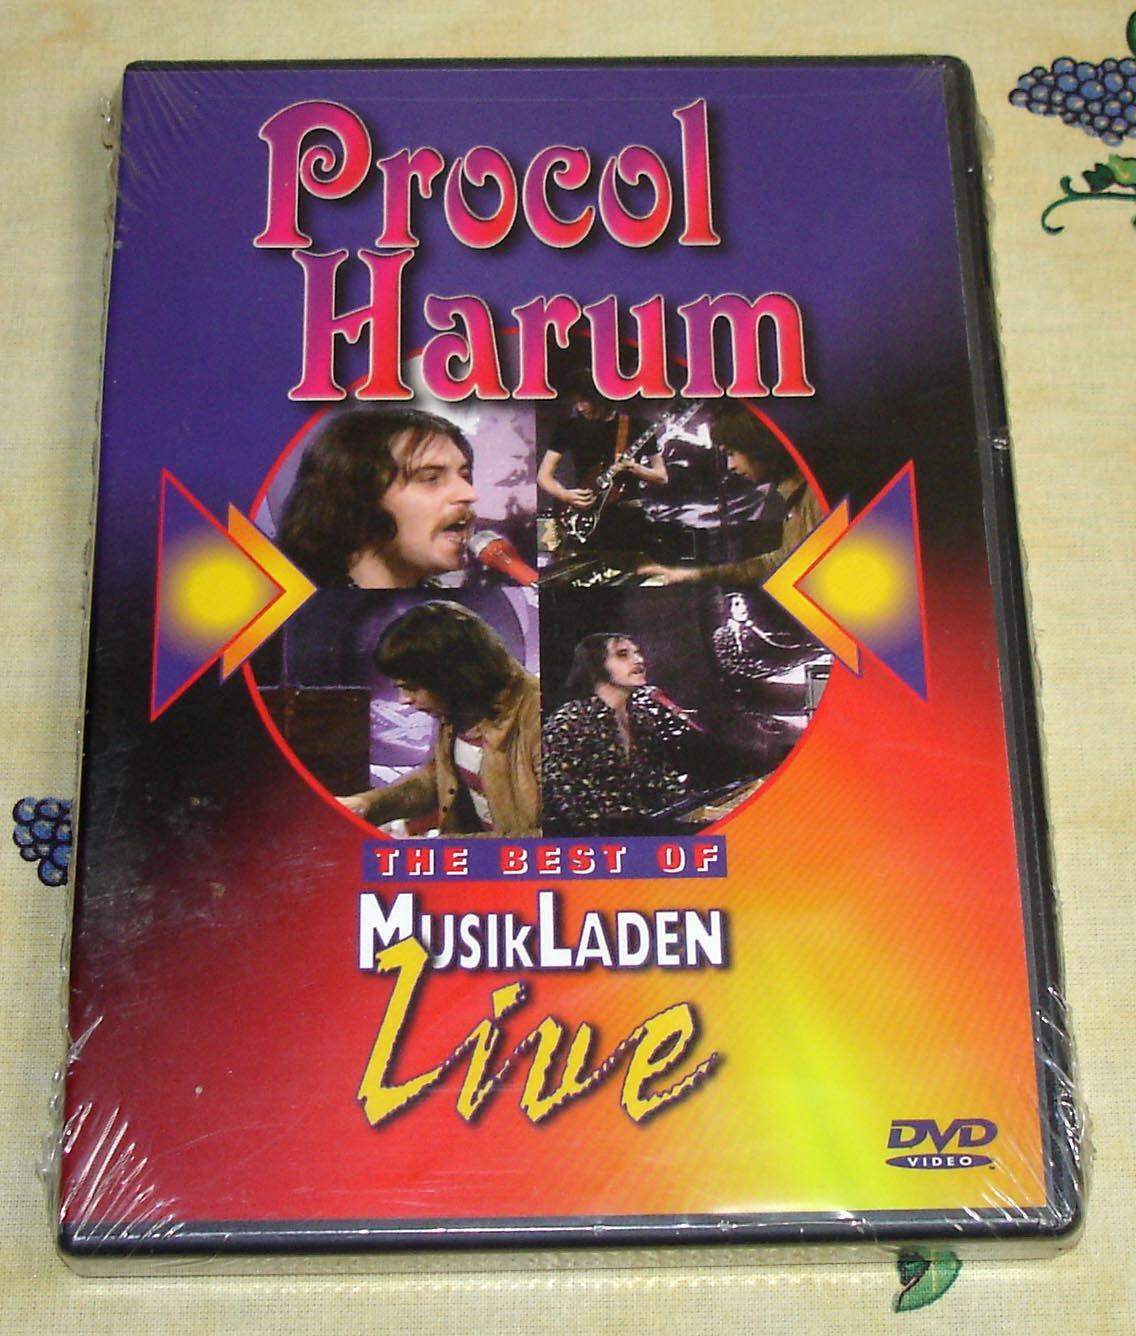 Procol Harum The Best Of MusikLaden Live DVD